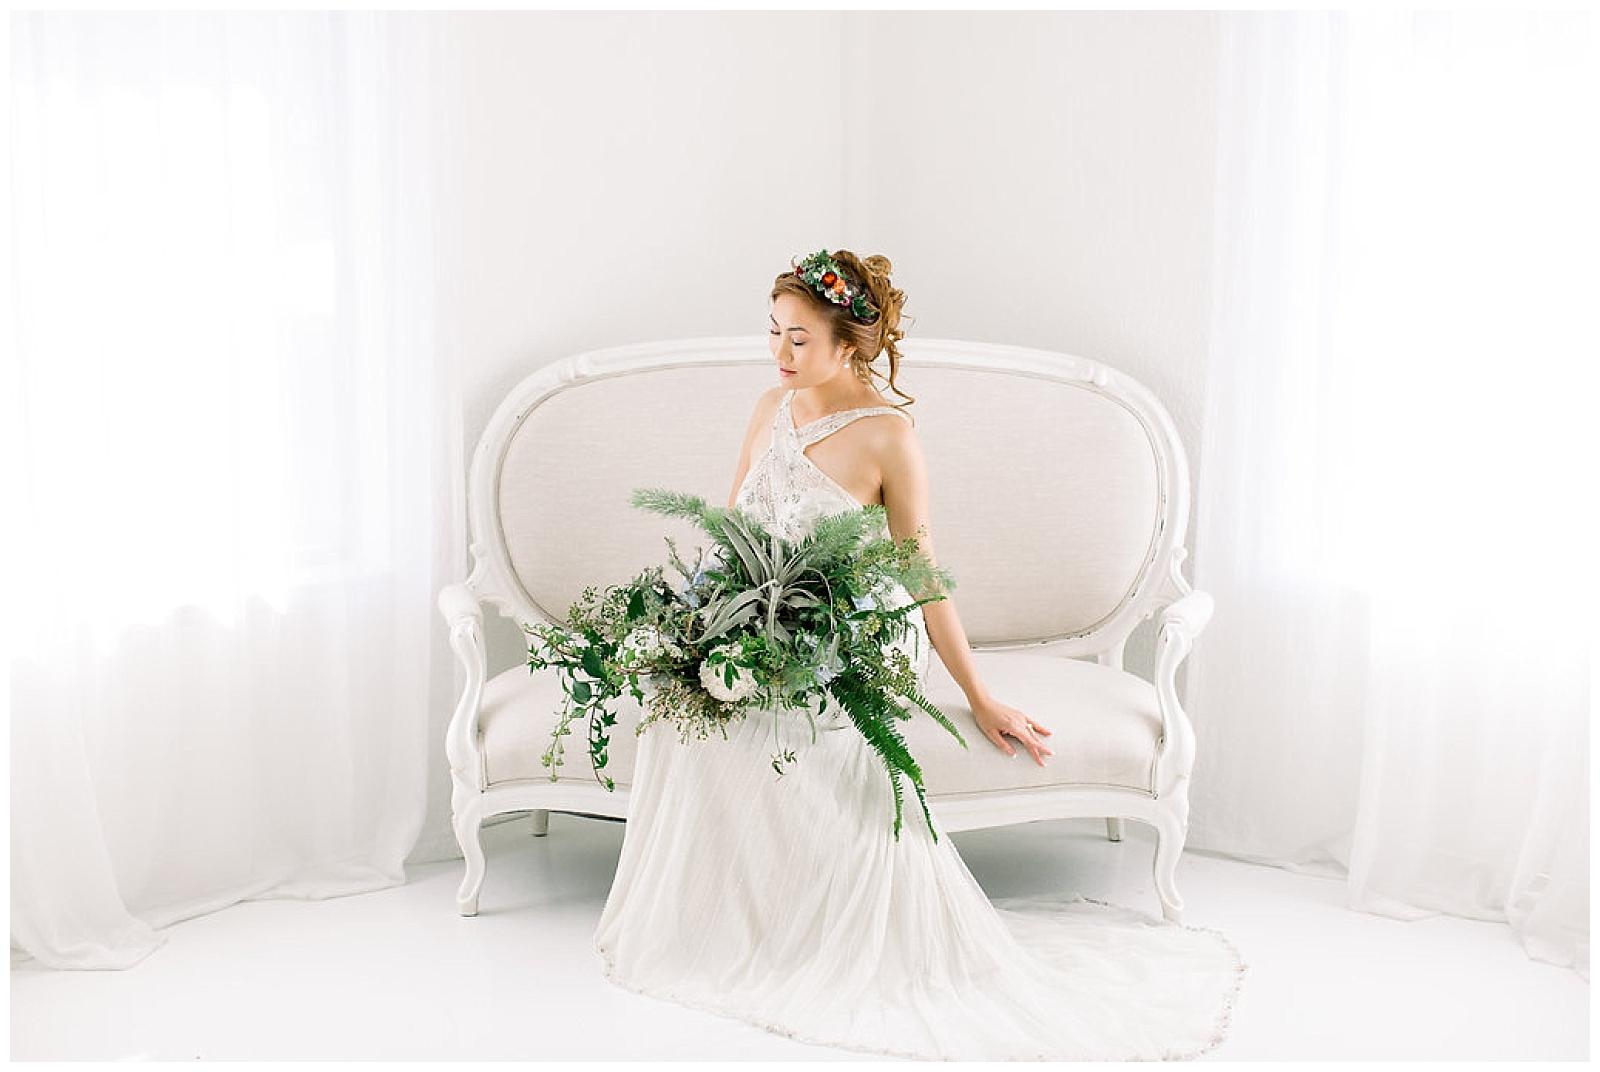 Living-Accessories-styled-shoot-de-joy-photography-epiphany-boutique-bridal-inspo.jpg